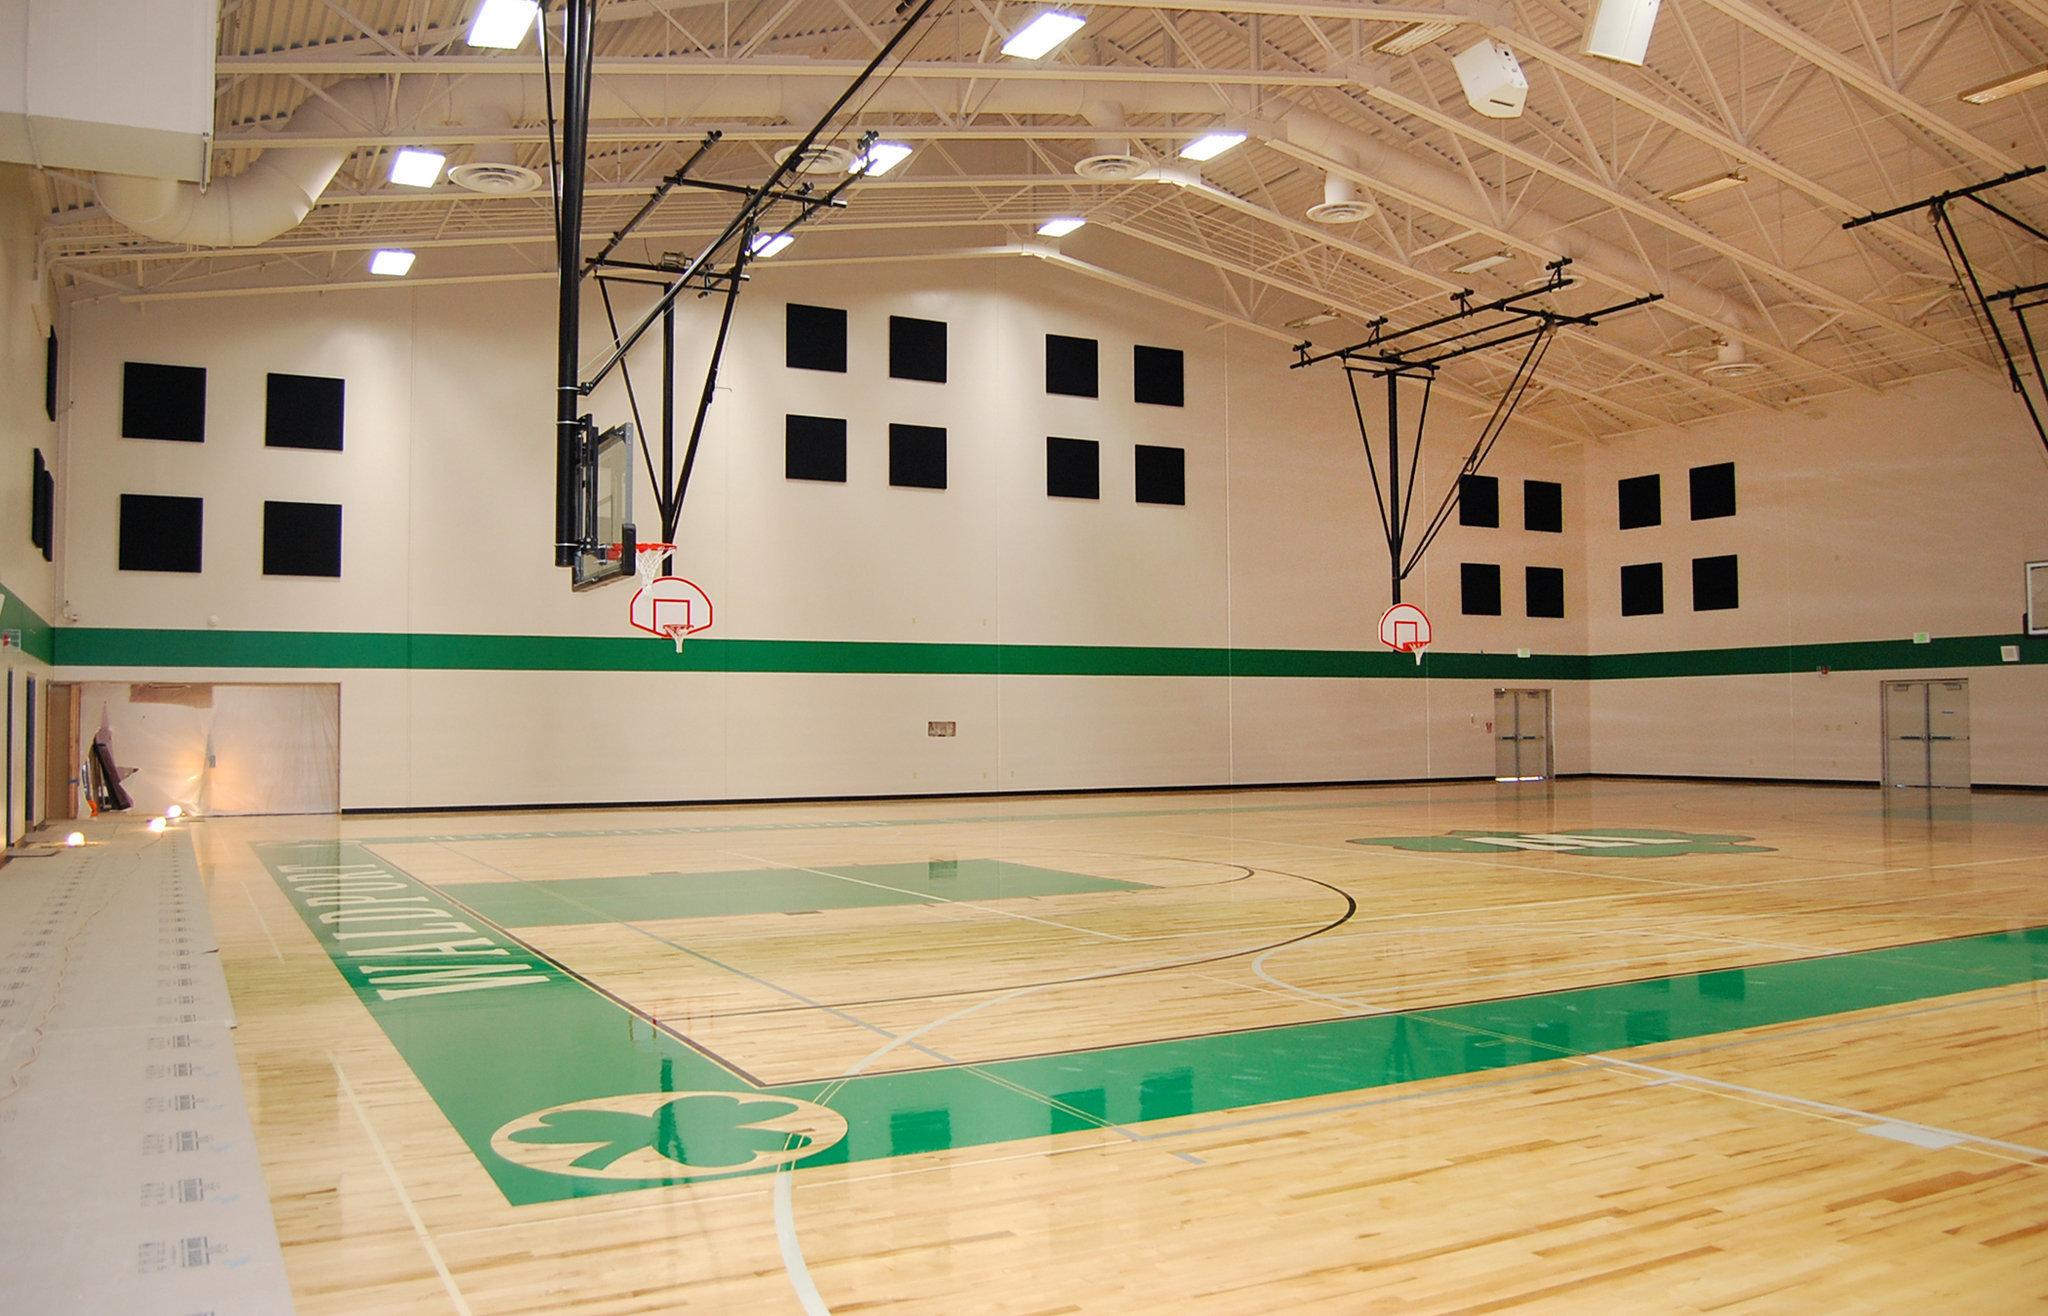 empty gym offseason.jpg